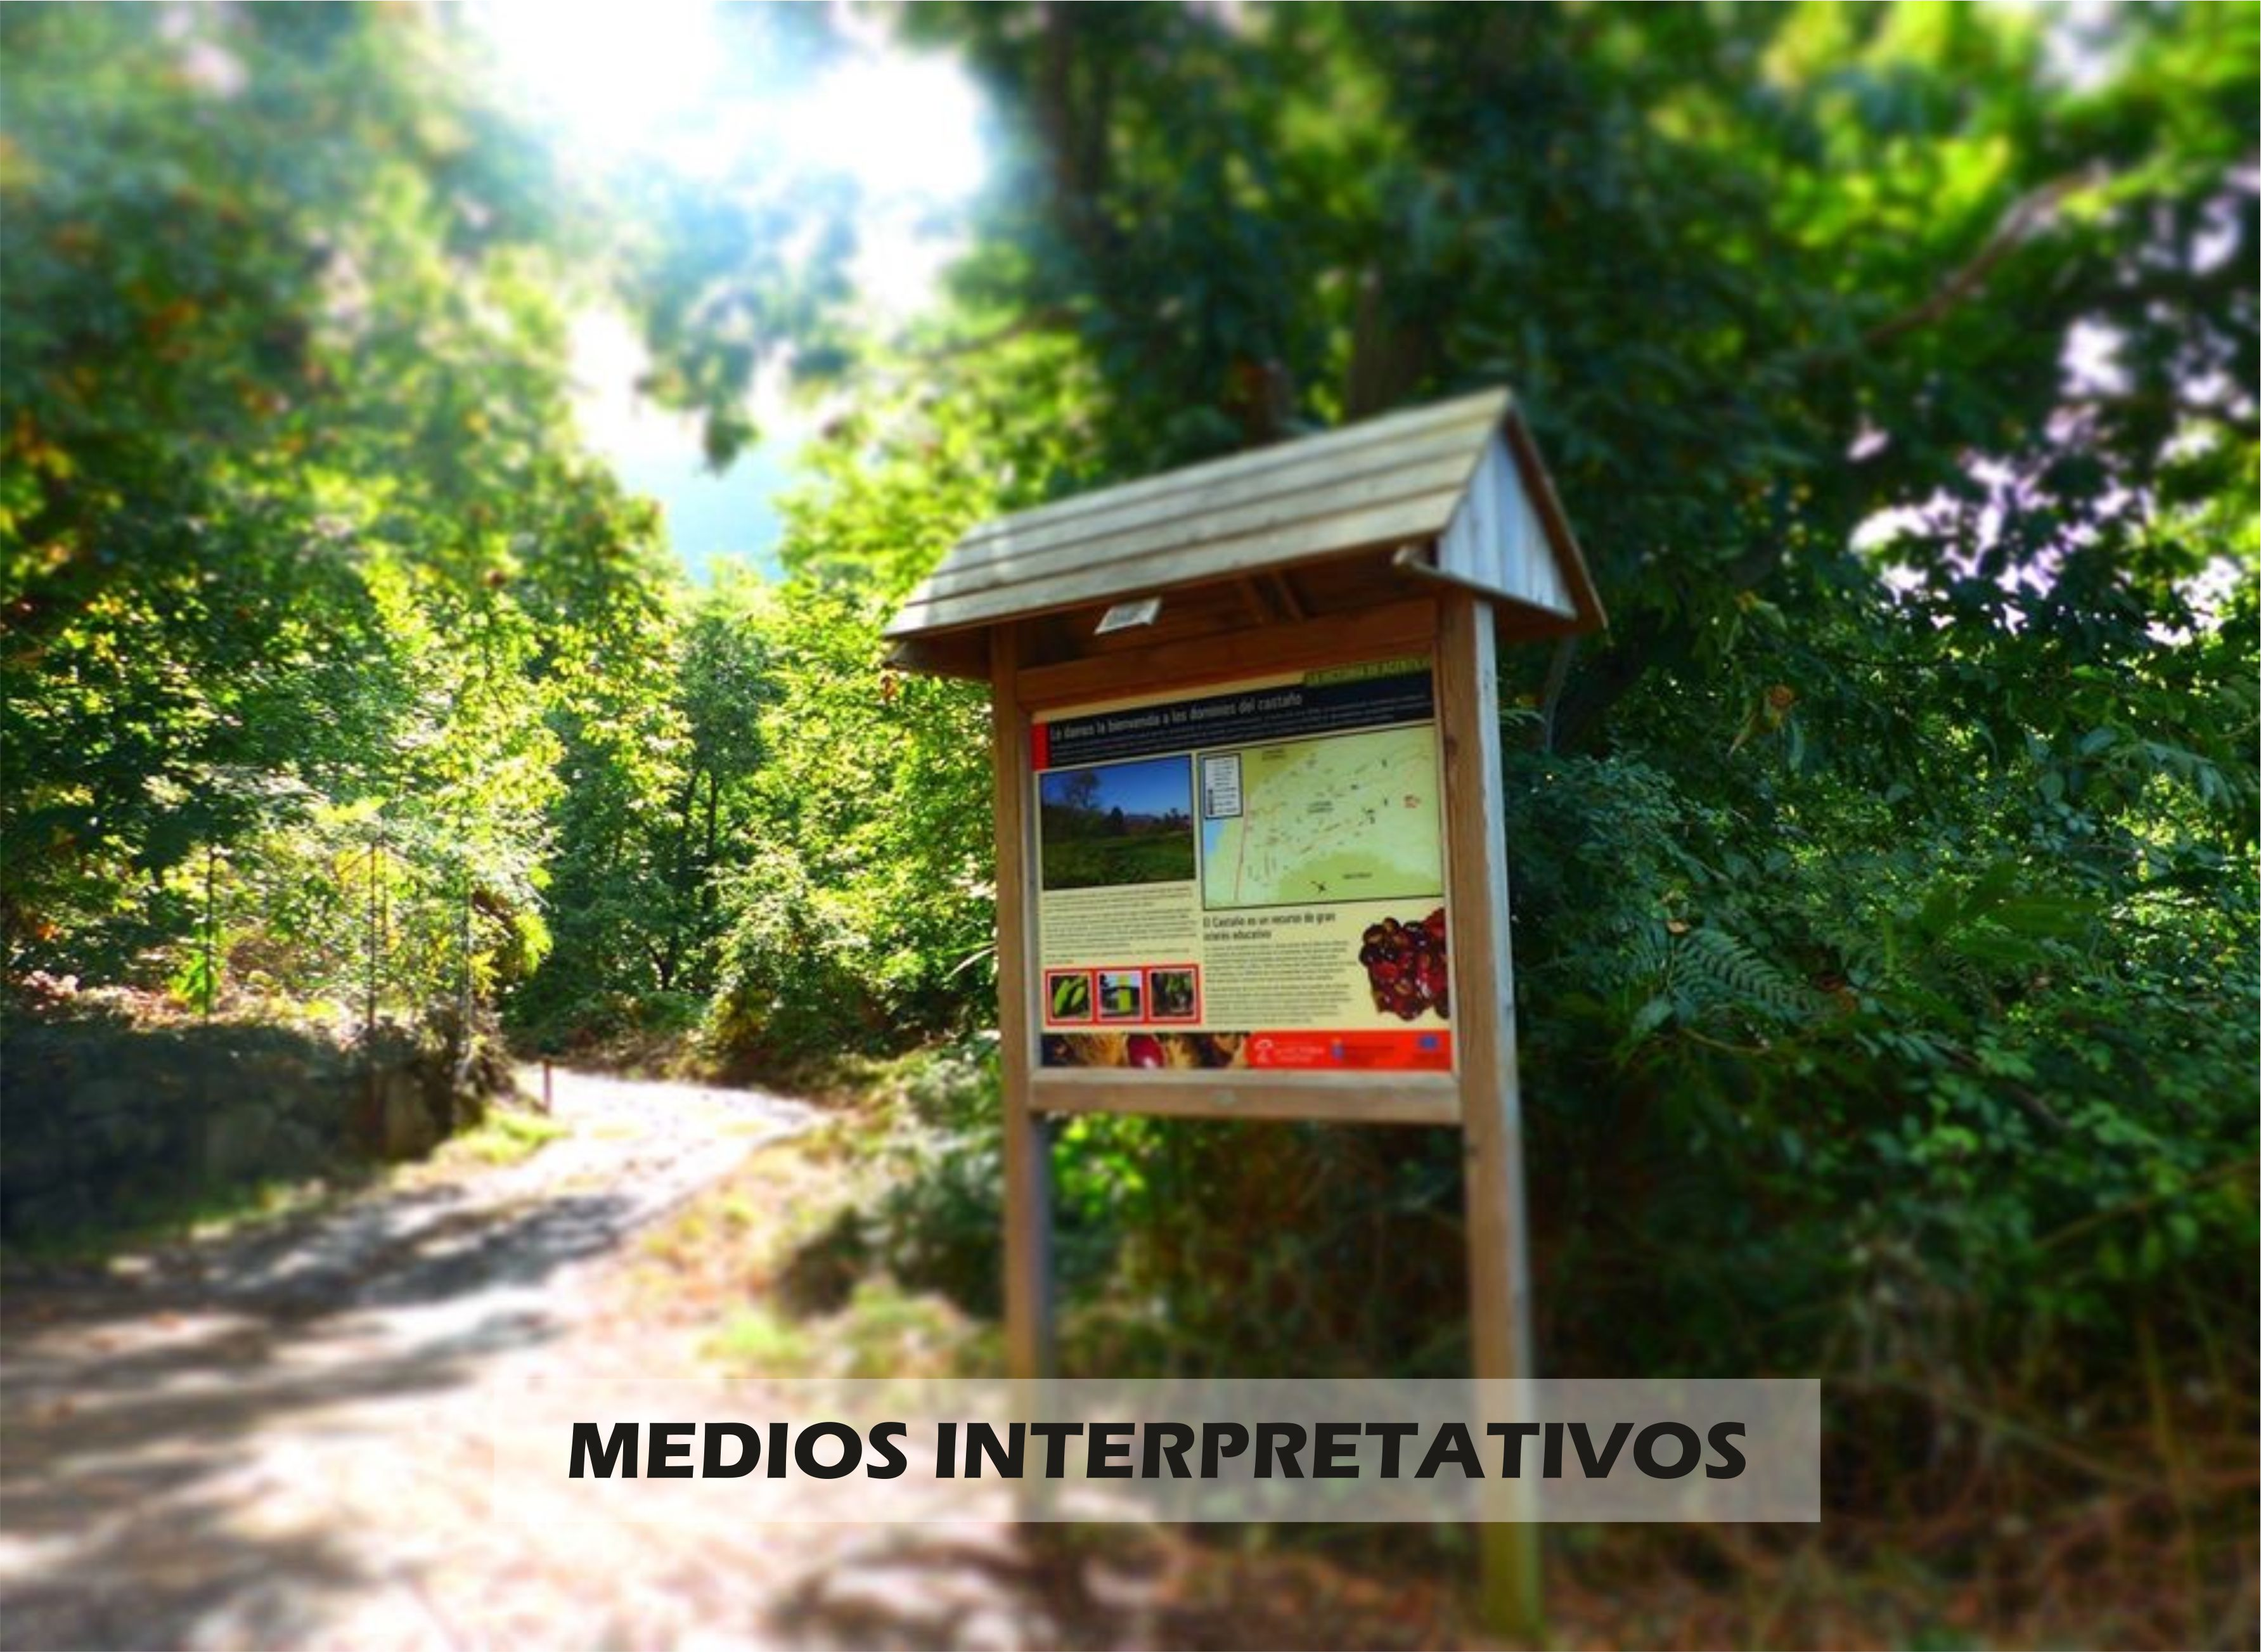 MEDIOS INTERPRETATIVOS.jpg